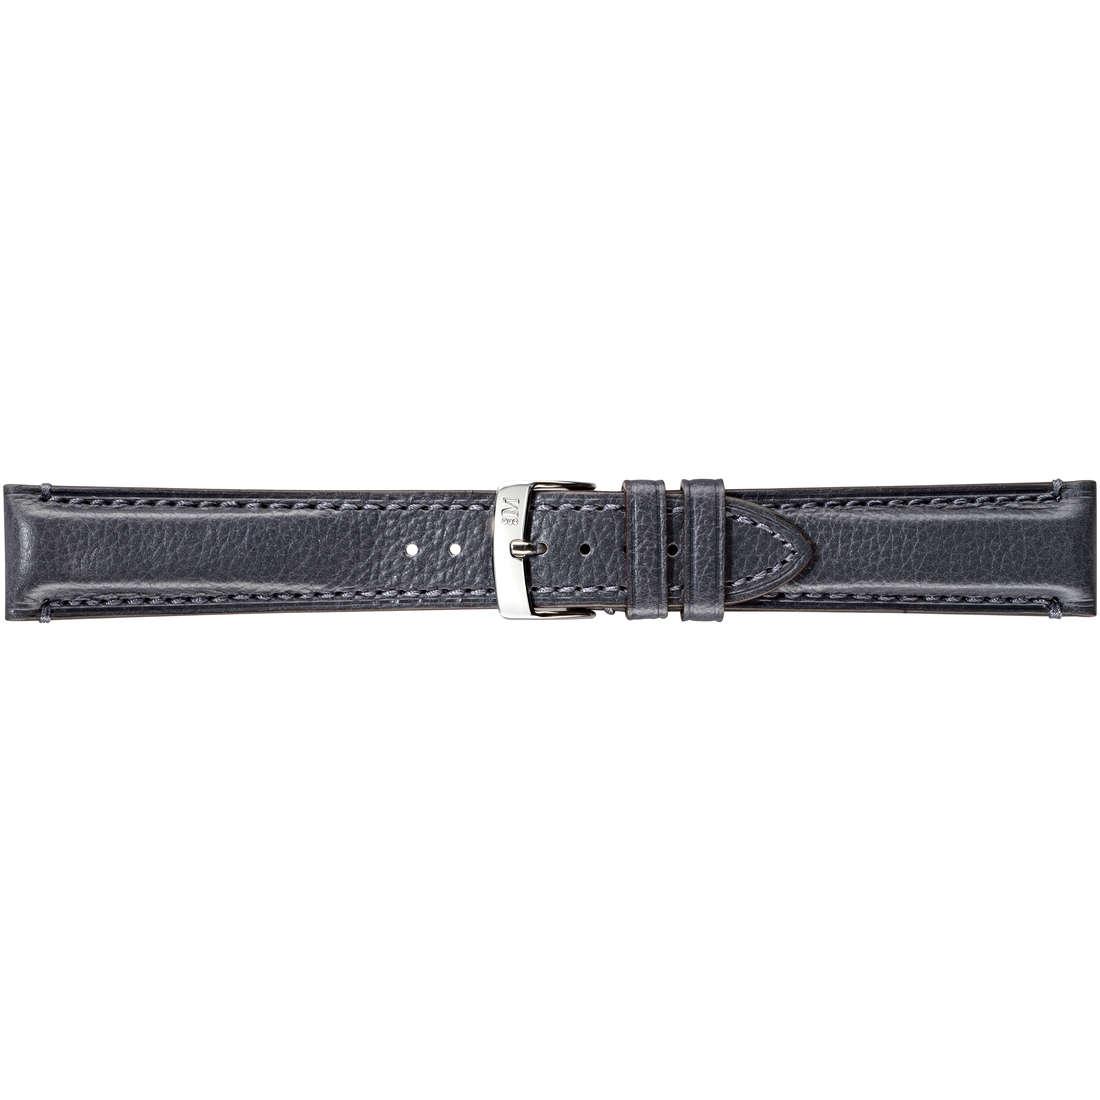 watch watch bands watch straps man Morellato Manufatti A01X4684B73092CR20